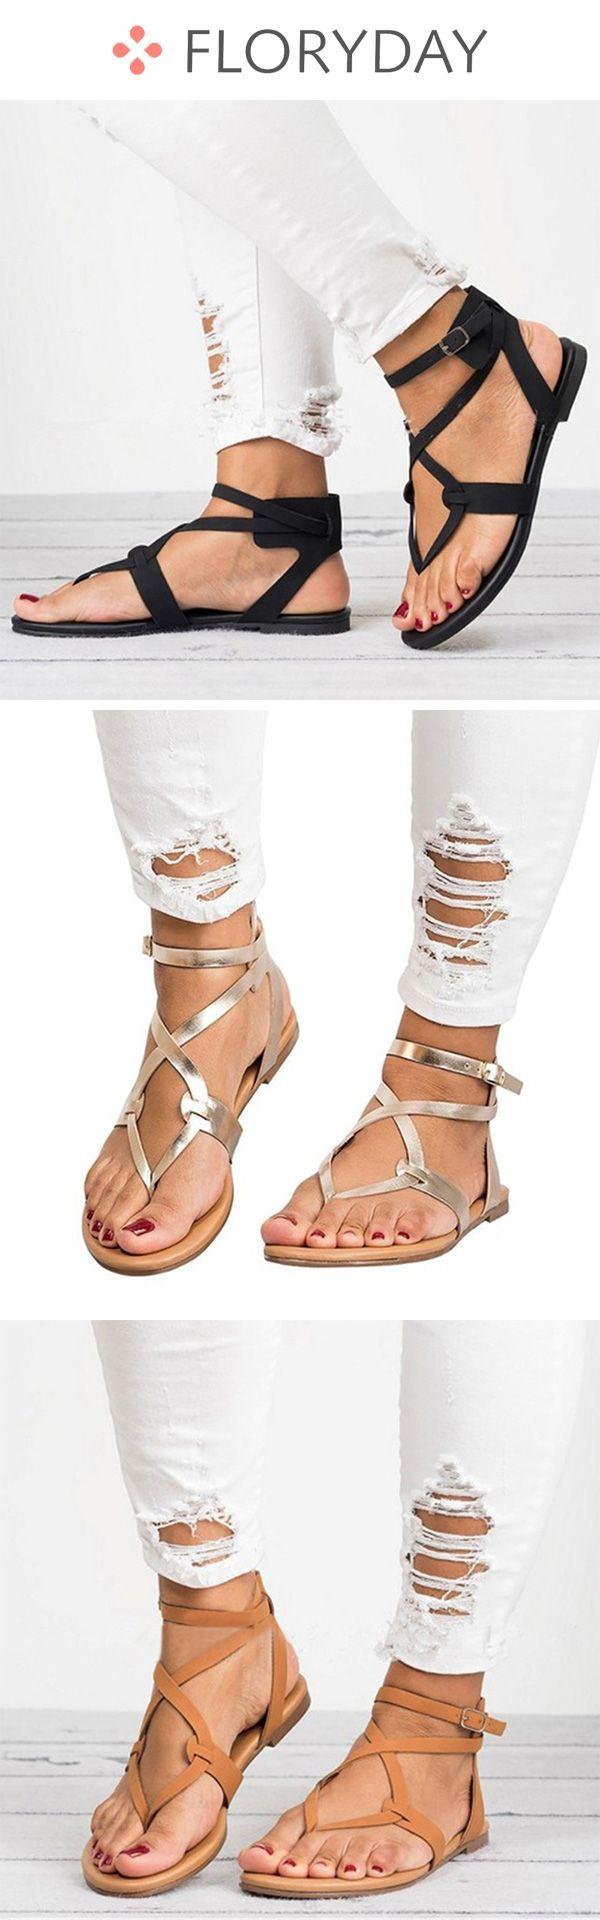 Buckle Flats PU Flat Heel Shoes, buckle shoes, flat shoes,